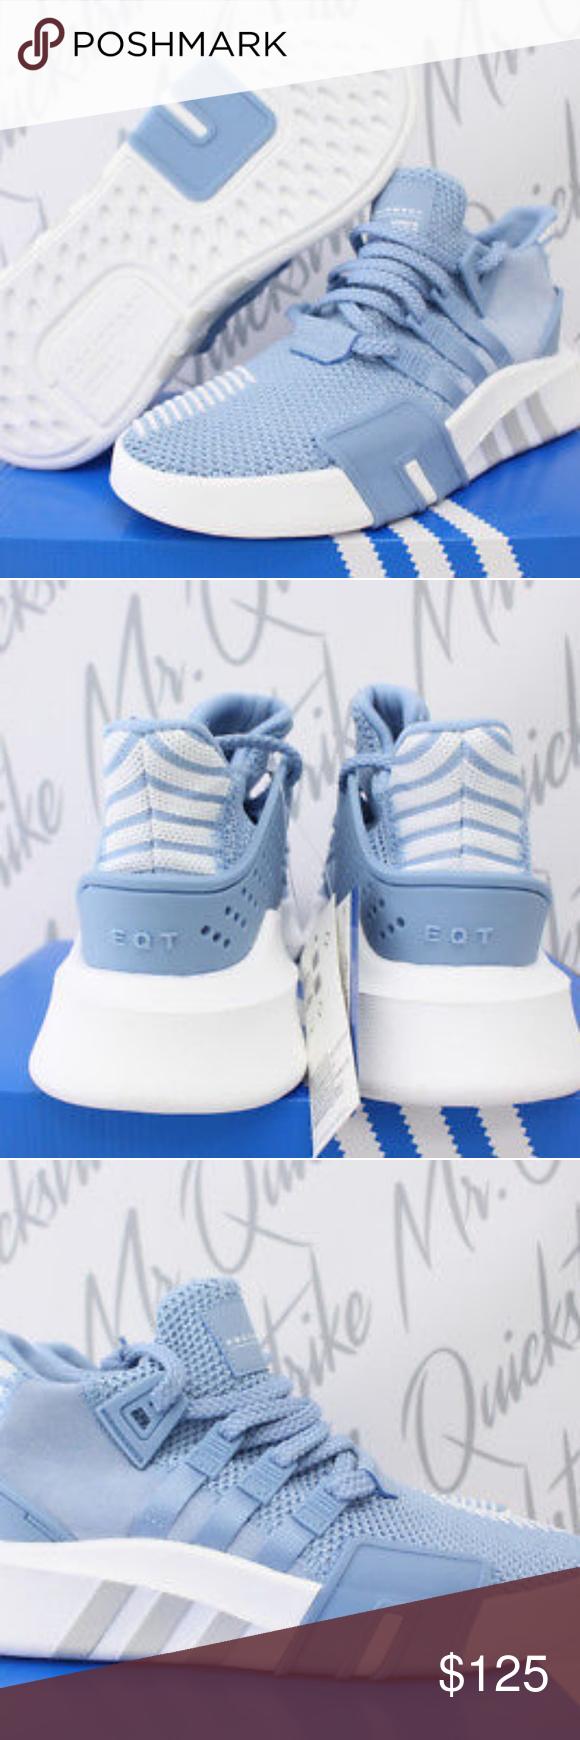 outlet store 0a46c 890bc WOMENS ADIDAS ORIGINALS EQT WOMENS ADIDAS ORIGINALS EQT BASKETBALL ADV SZ 7 ASH  BLUE CLOUD WHITE adidas Shoes Athletic Shoes